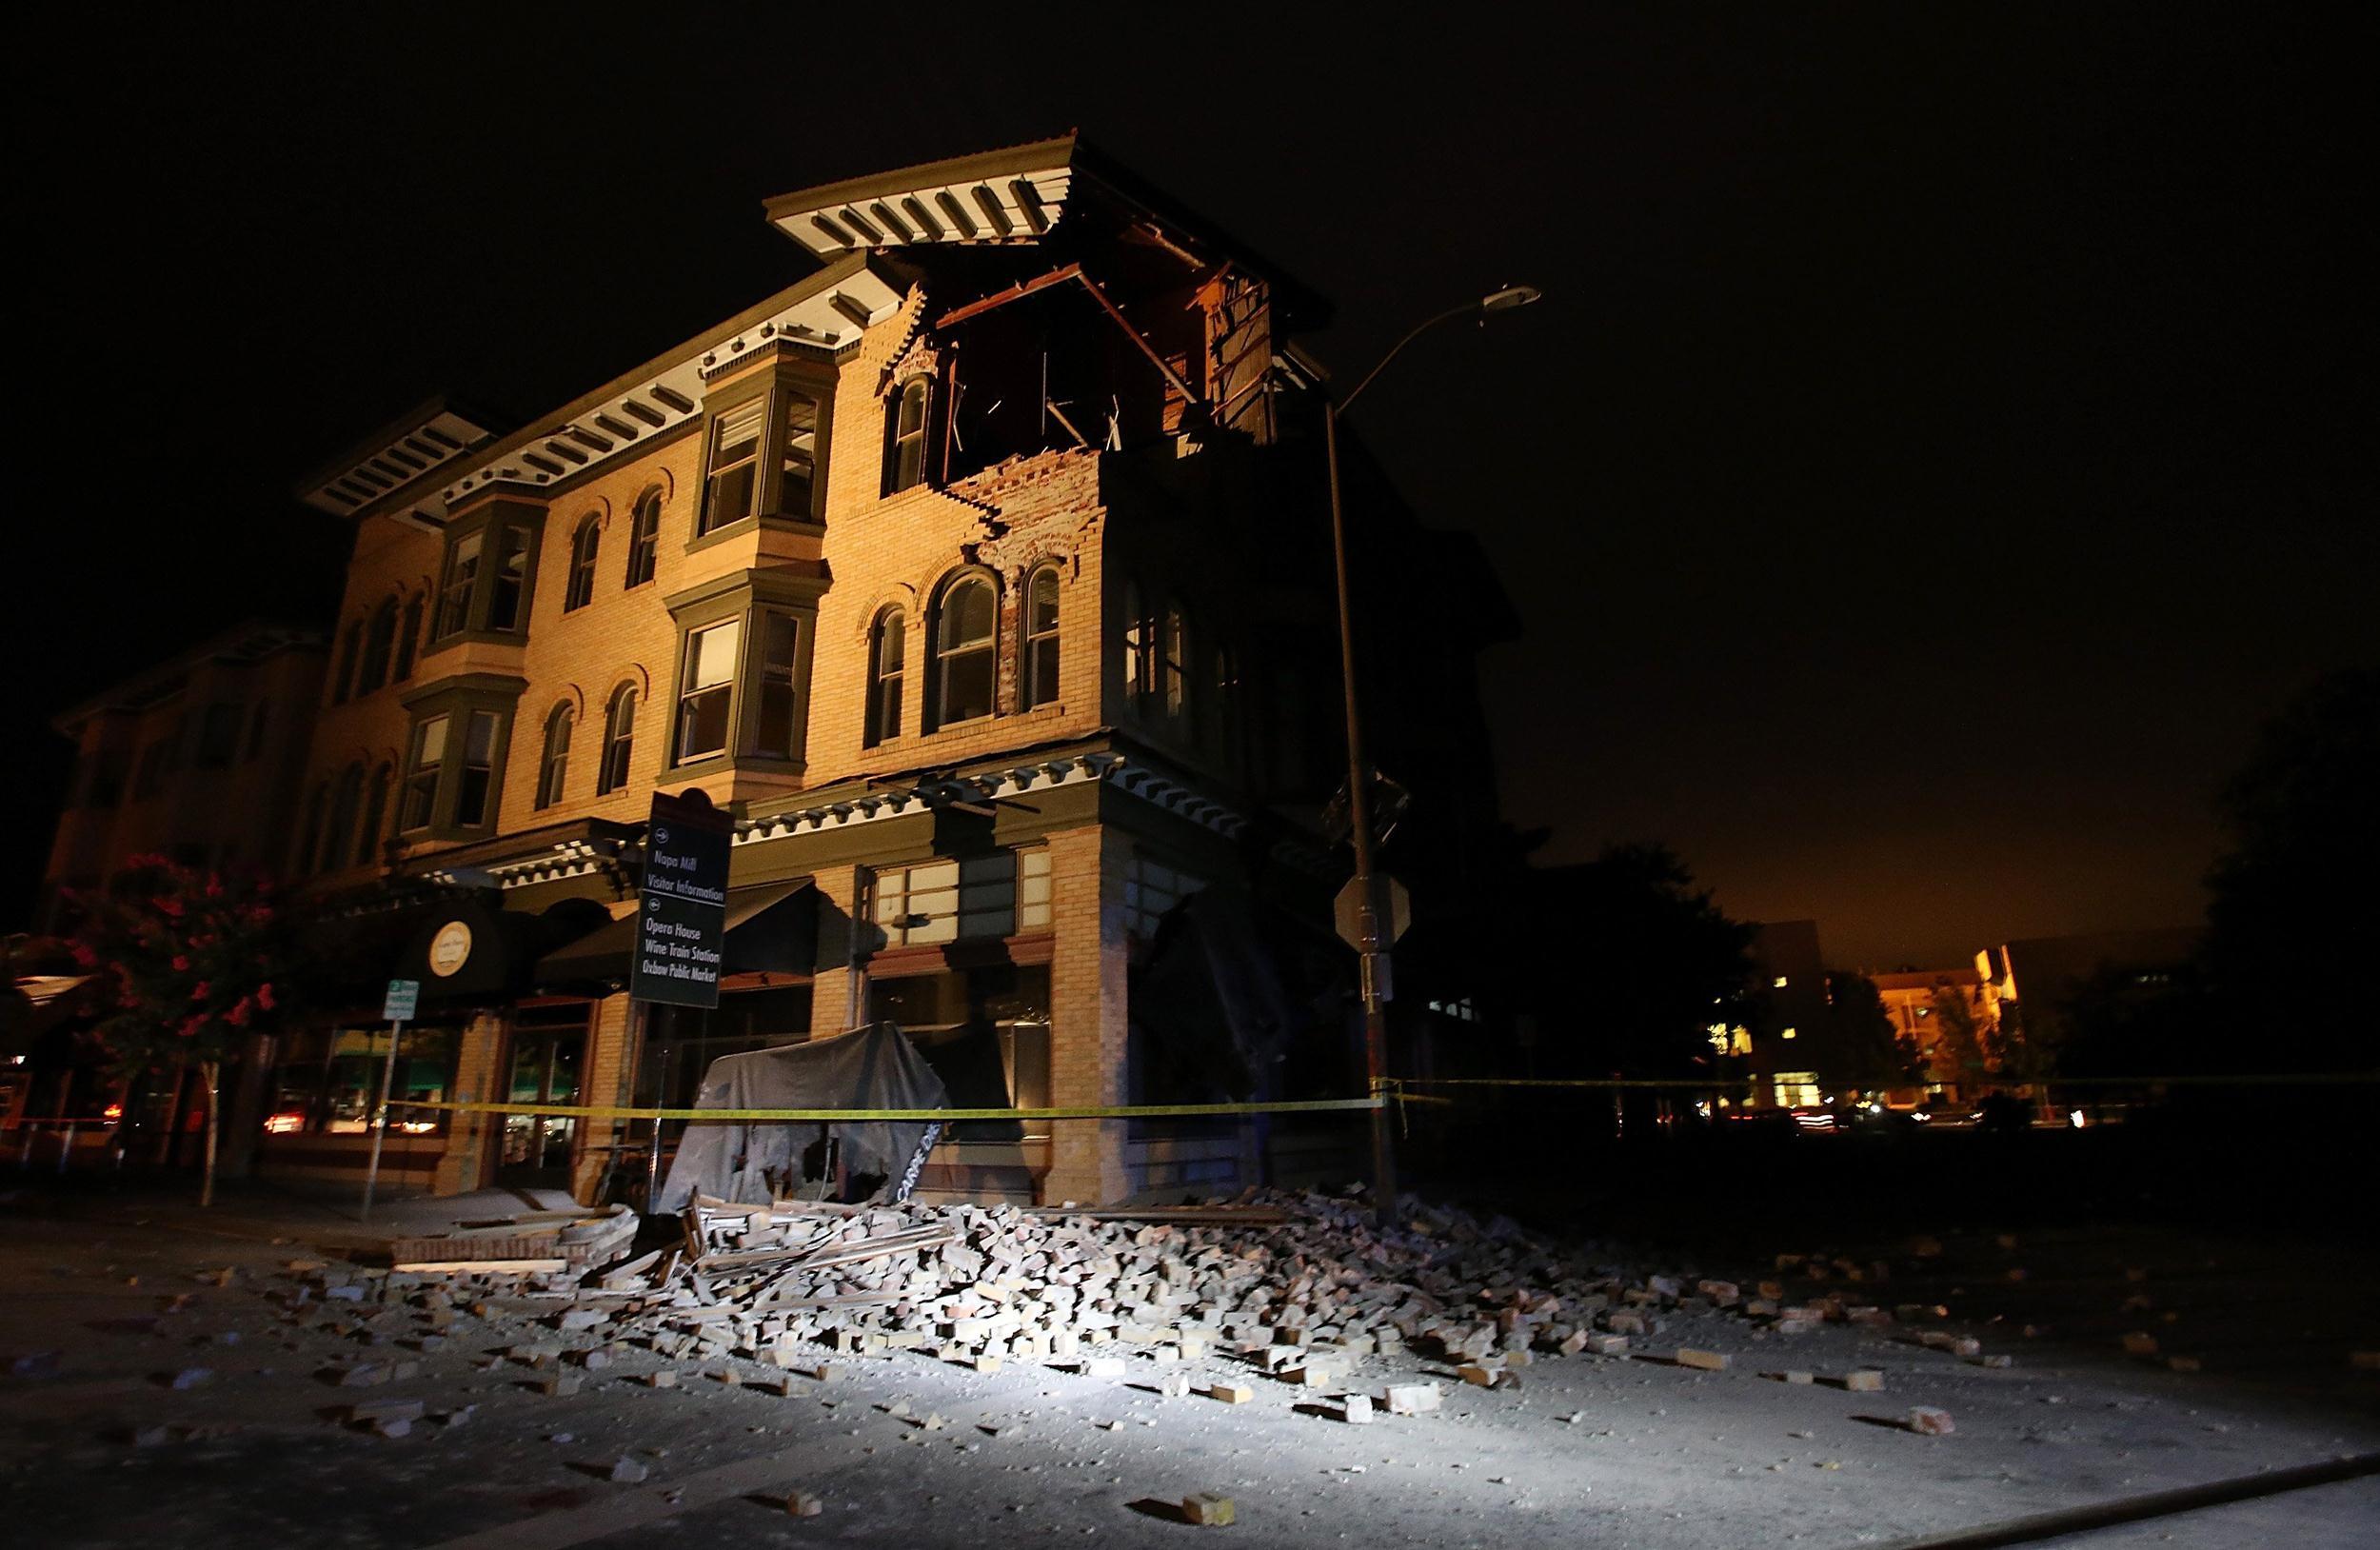 Image: 6.0 Earthquake Rattles Northern California